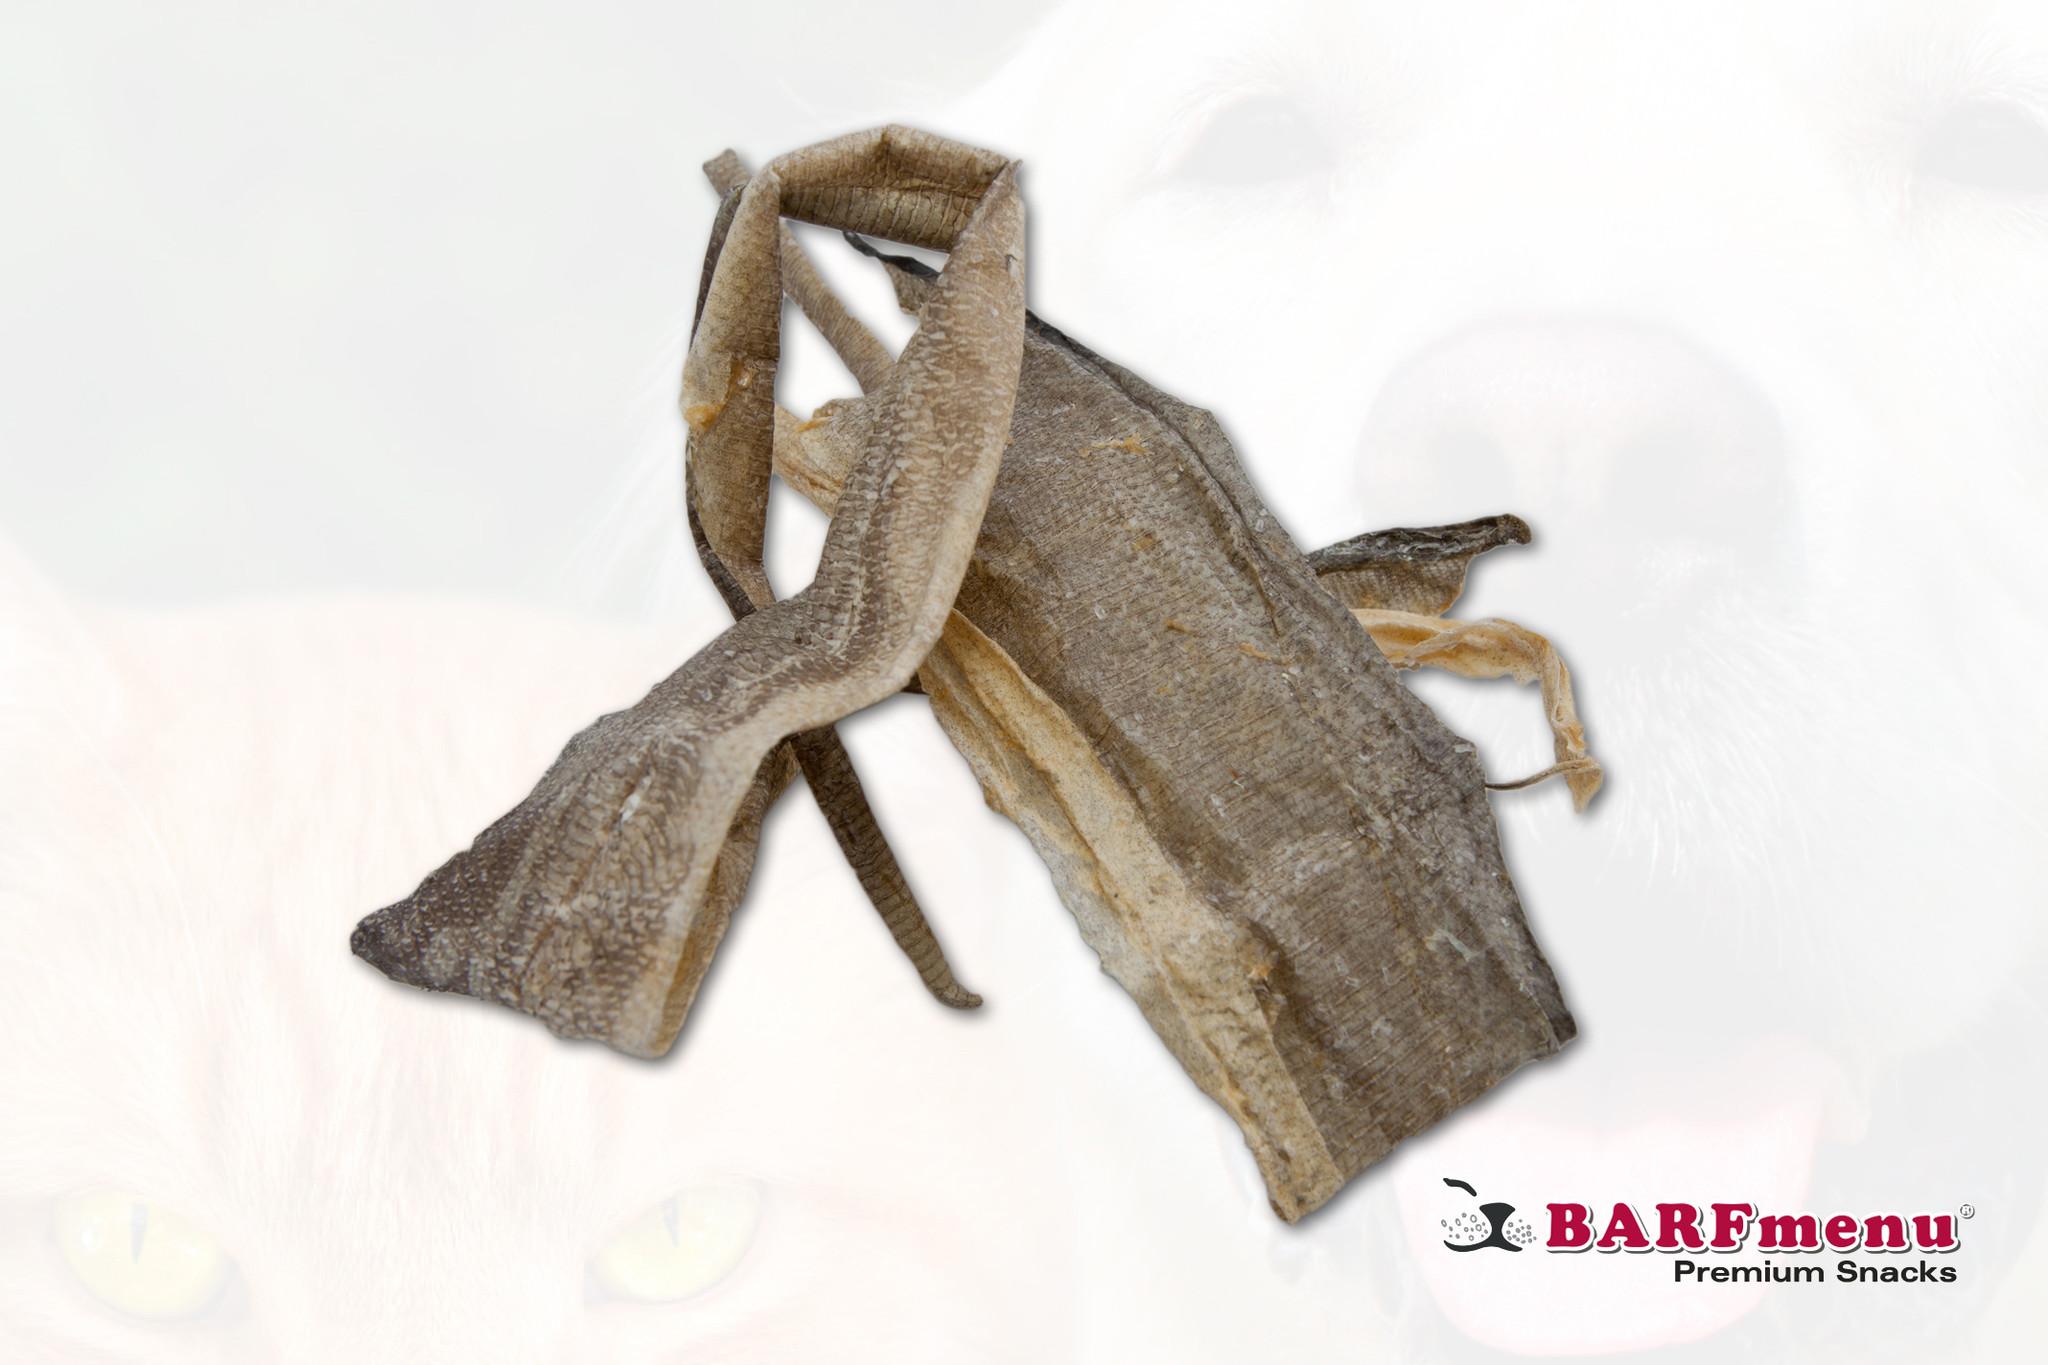 BARFmenu Premium Snack Gedroogde vishuiden